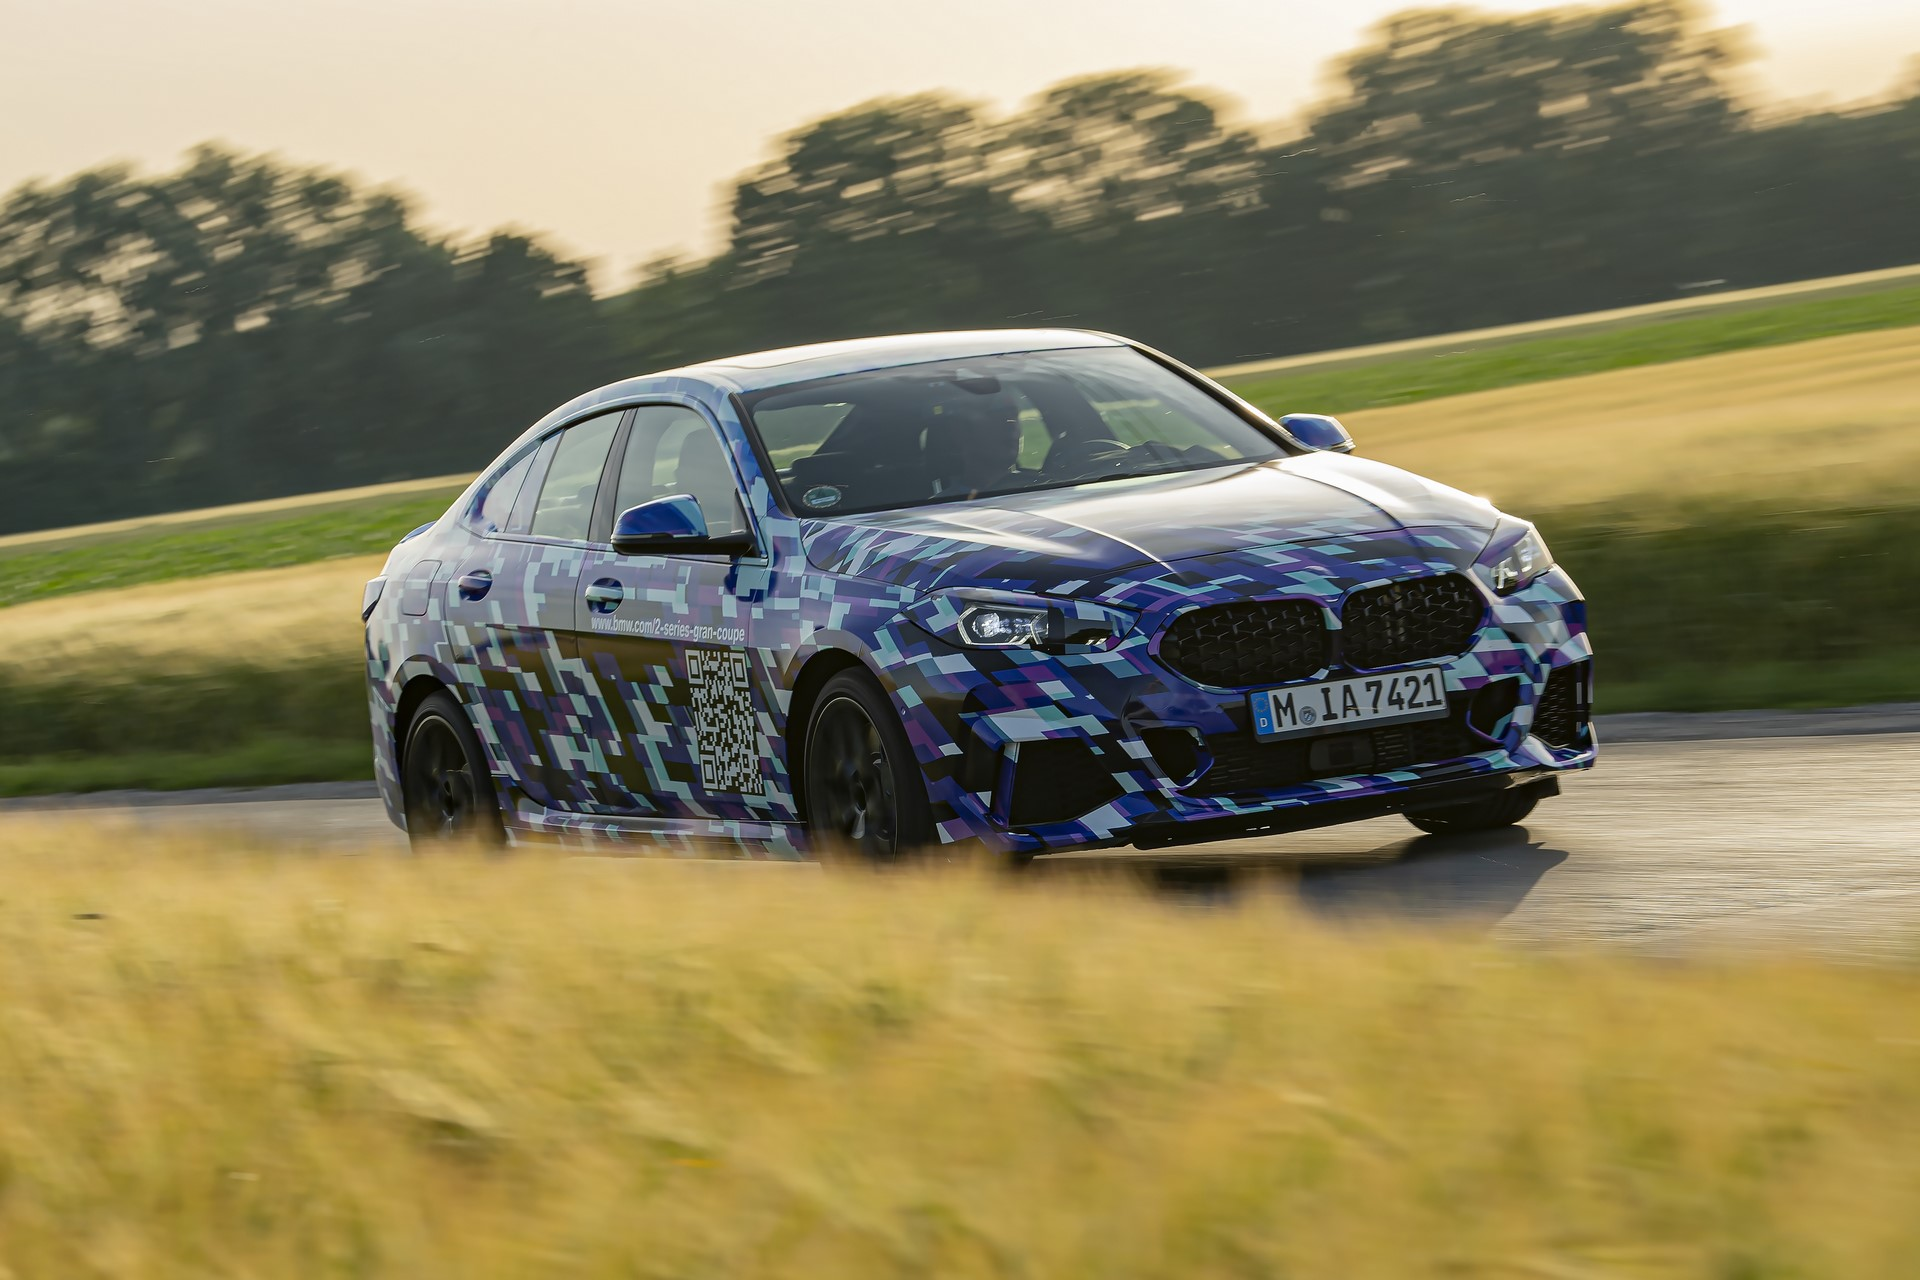 BMW-2-Series-Gran-Coupe-2020-spy-photos-16